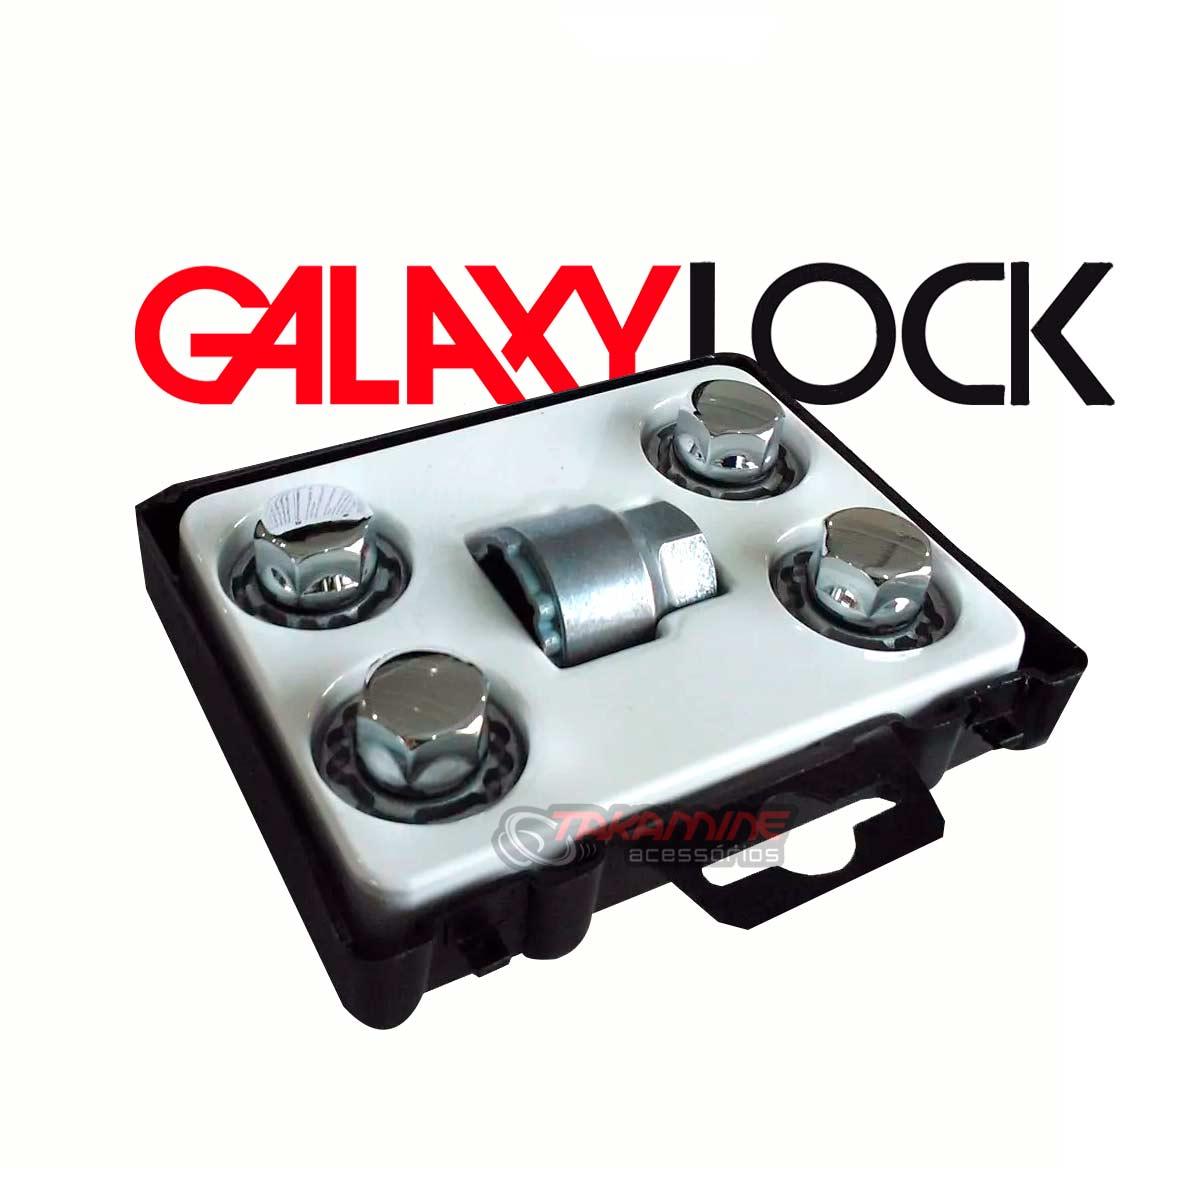 Porca antifurto para rodas Galaxy Lock Rav4 2011 até 2020 (roda de liga) 382/M